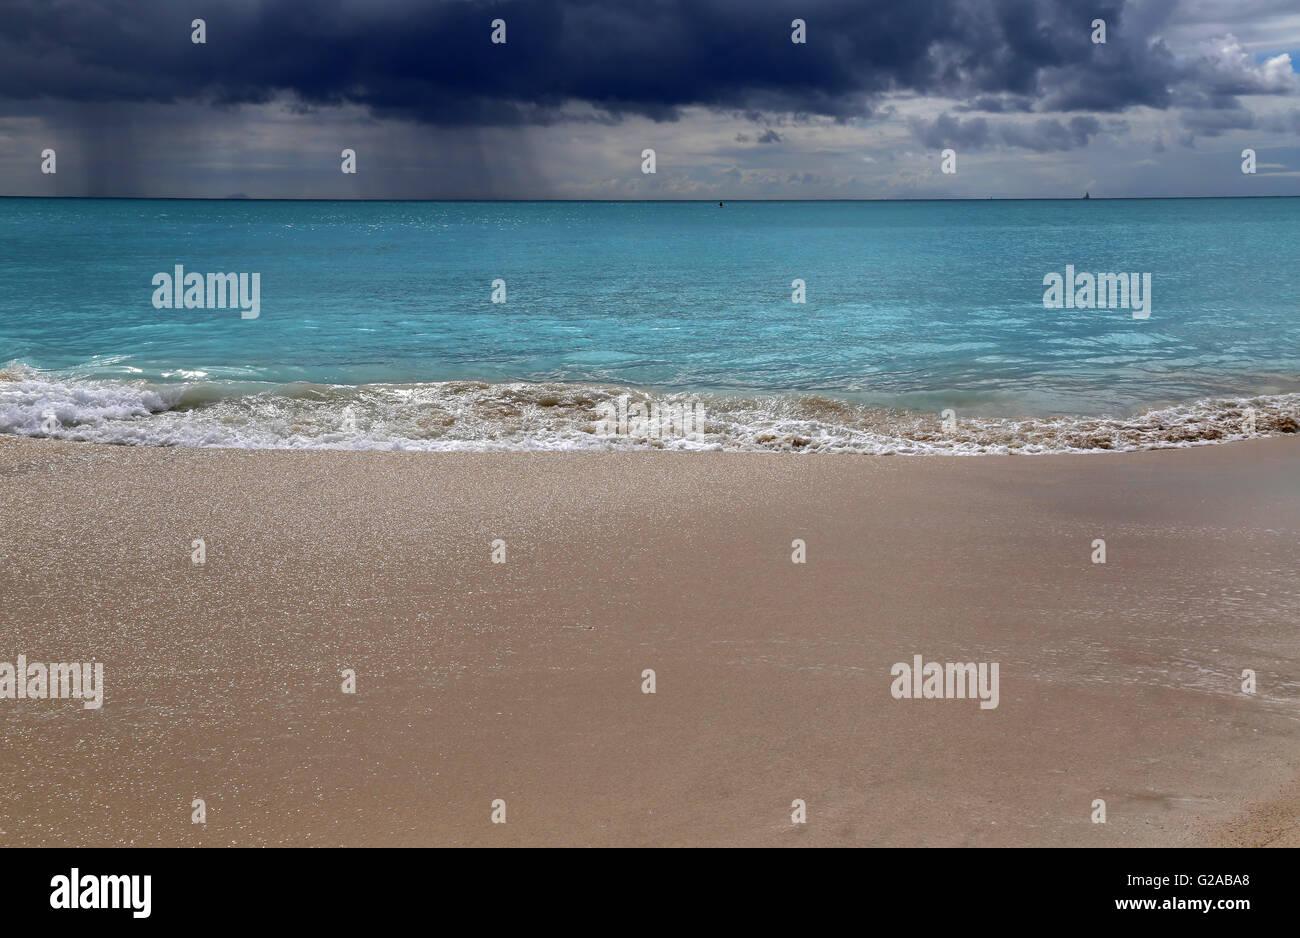 Storm clouds and rain on the horizon, Jolly Bay beach, Antigua, Caribbean - Stock Image